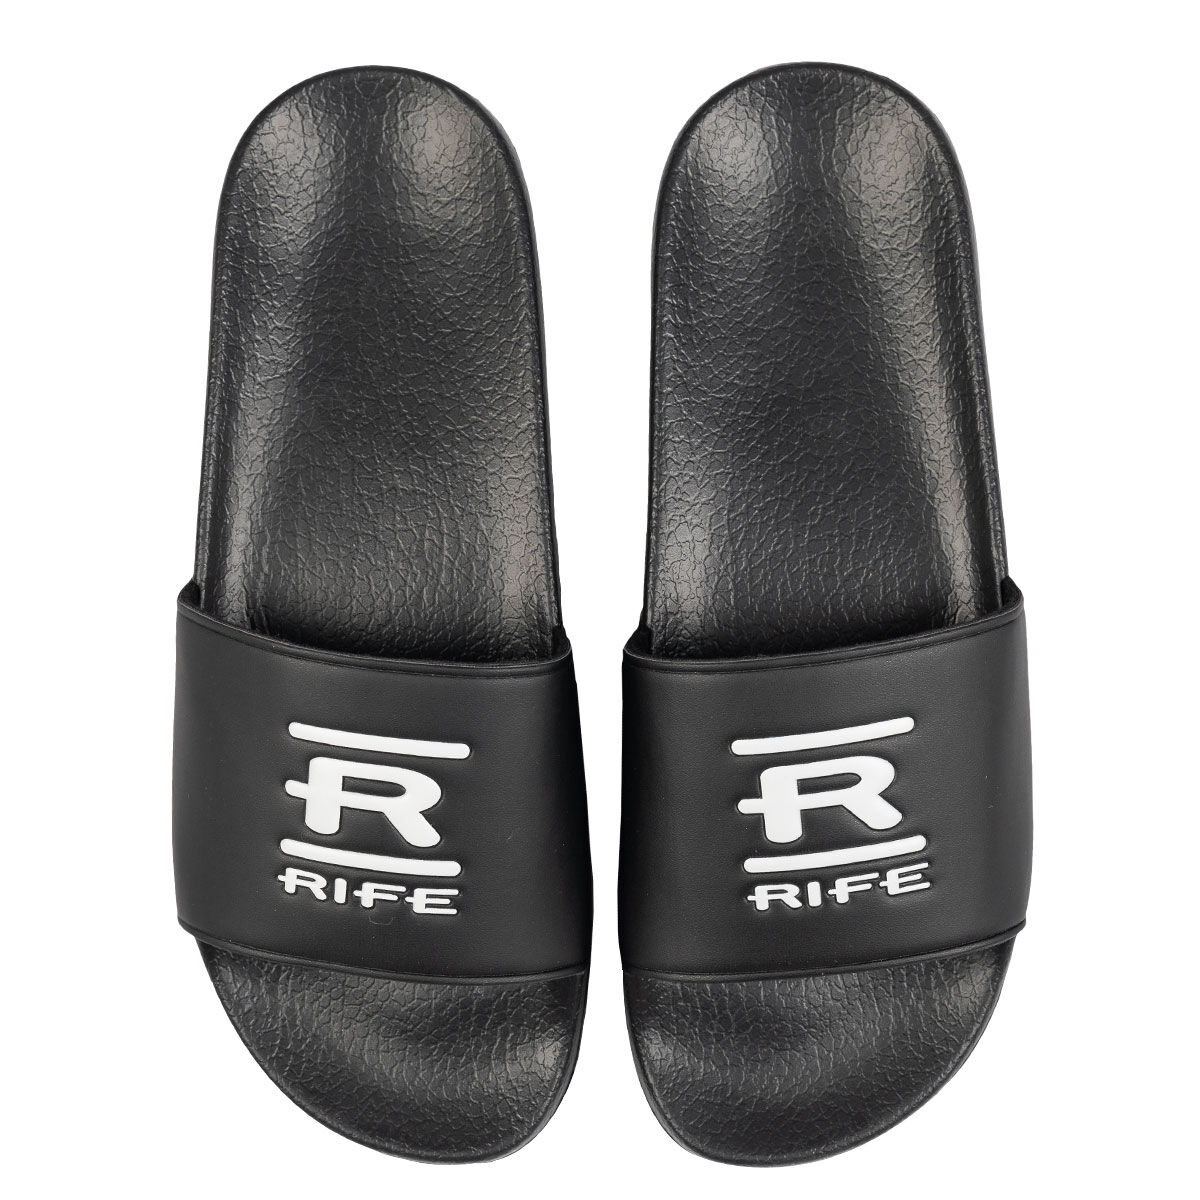 Rife Mens Black Lightweight Golf Sliders, Size: 10